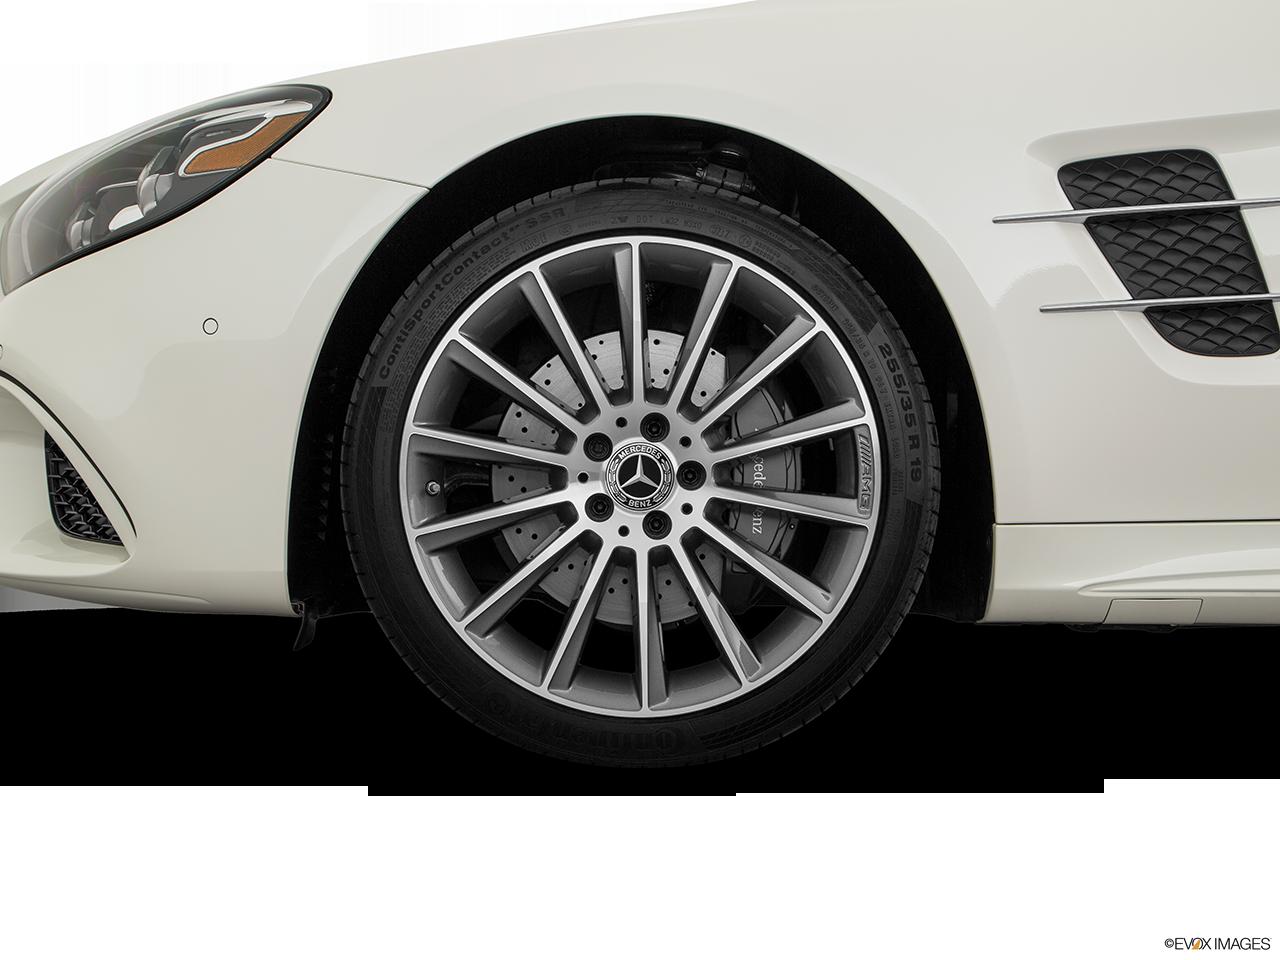 2019 Mercedes-Benz SL-Class photo